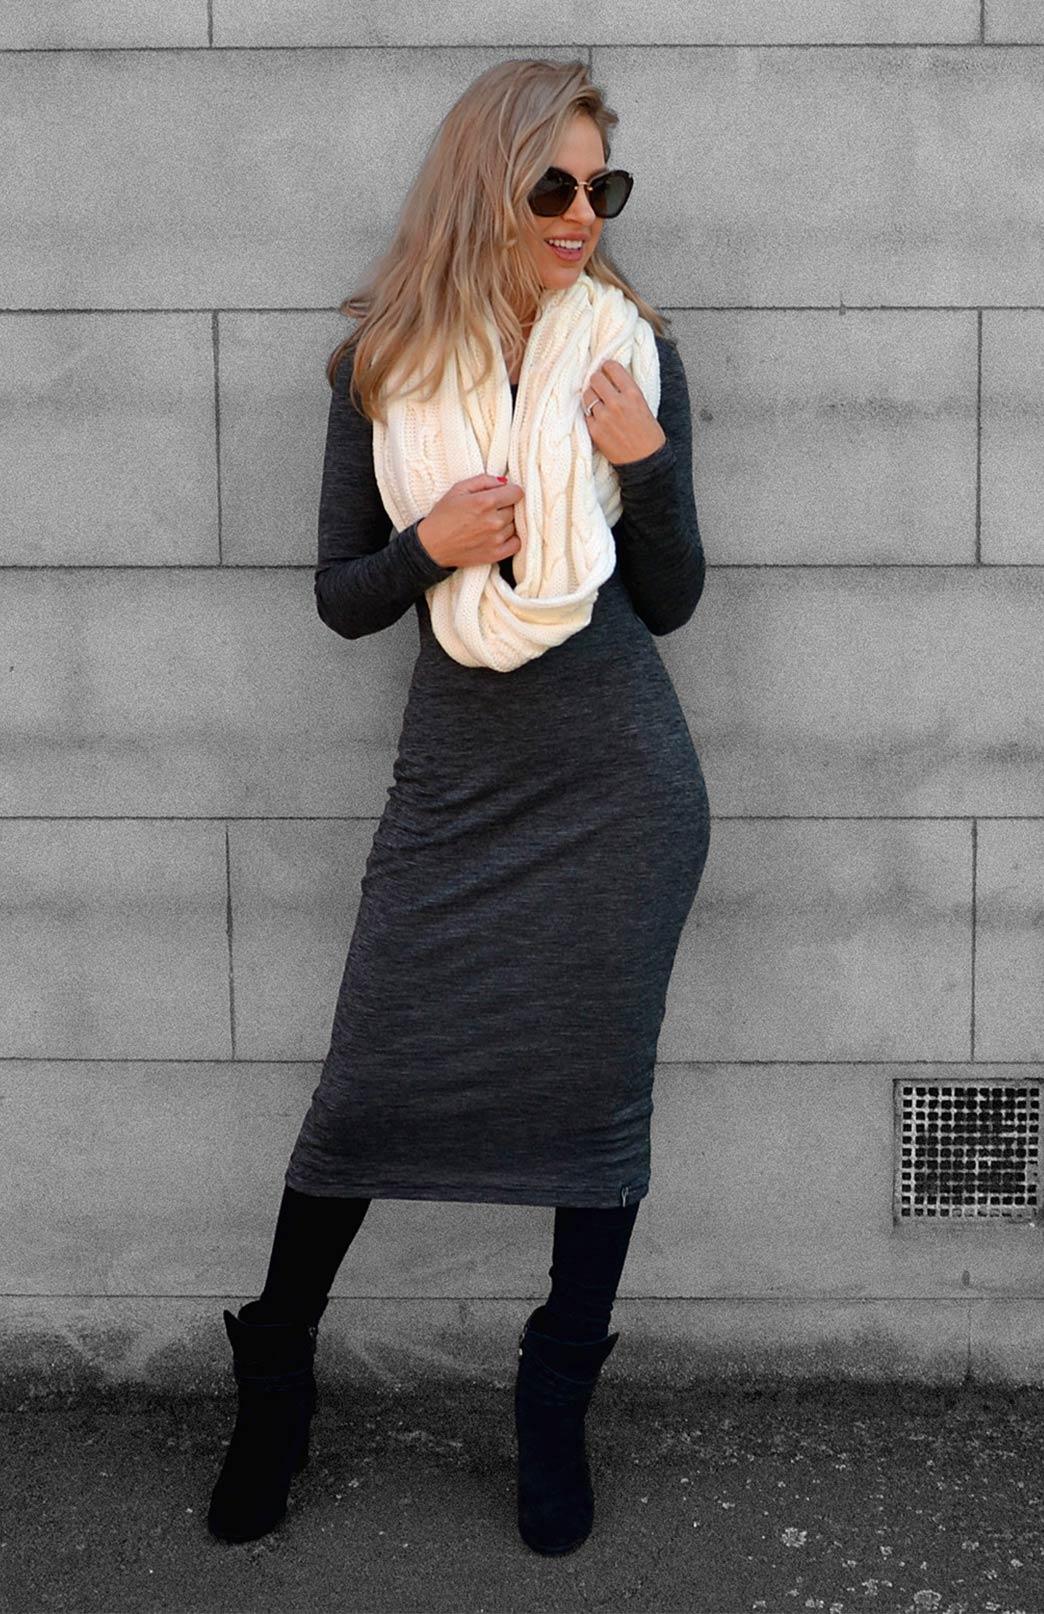 Lana Dress - Women's Black Pinstripe Merino Wool Classic Long Sleeve Dress - Smitten Merino Tasmania Australia